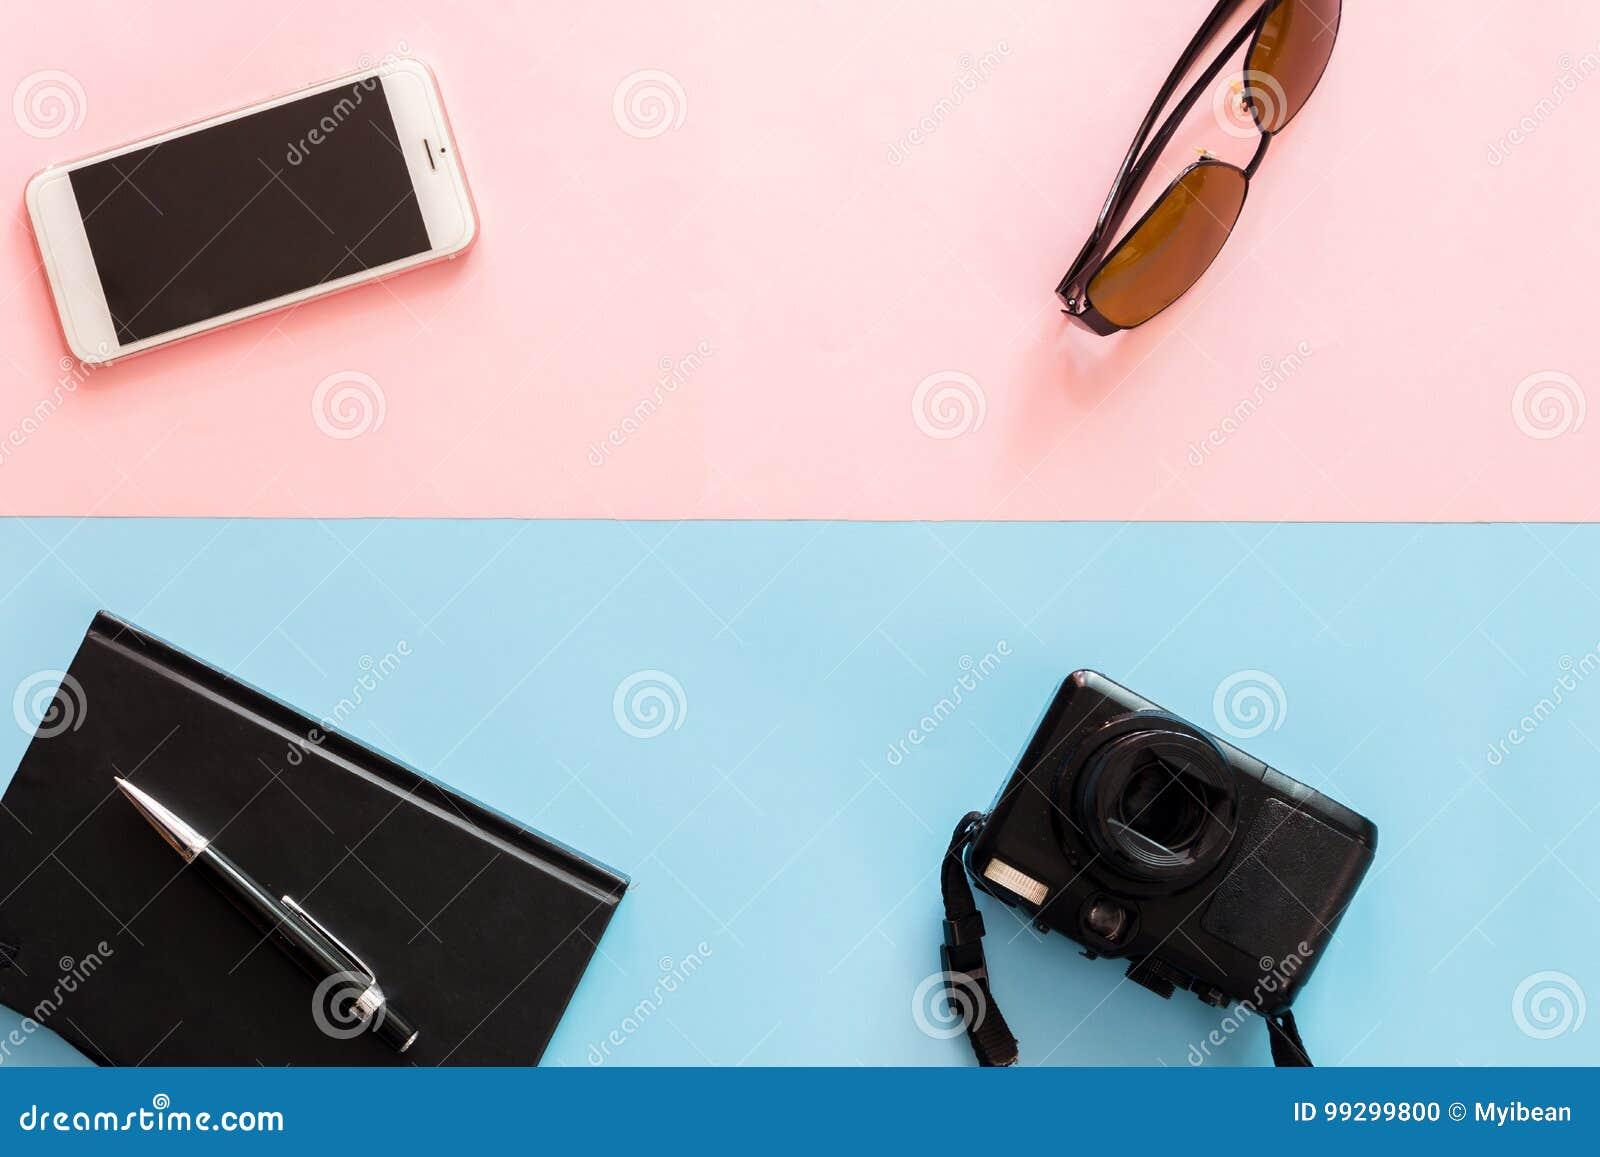 9b53d522ba Επίπεδος βάλτε την έννοια ταξιδιού με τη κάμερα